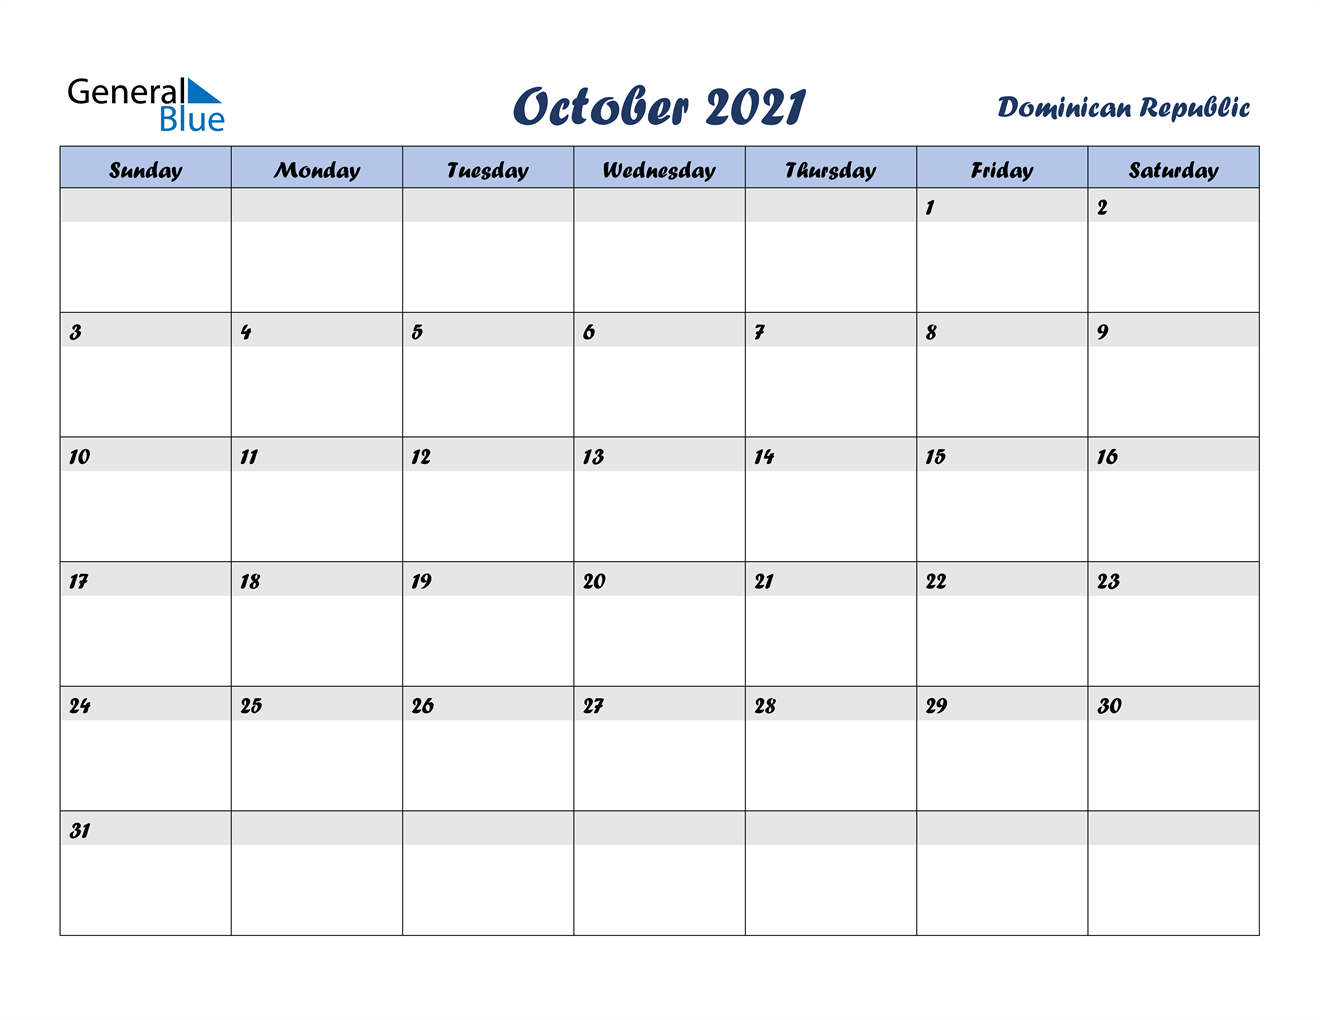 October 2021 Calendar Dominican Republic